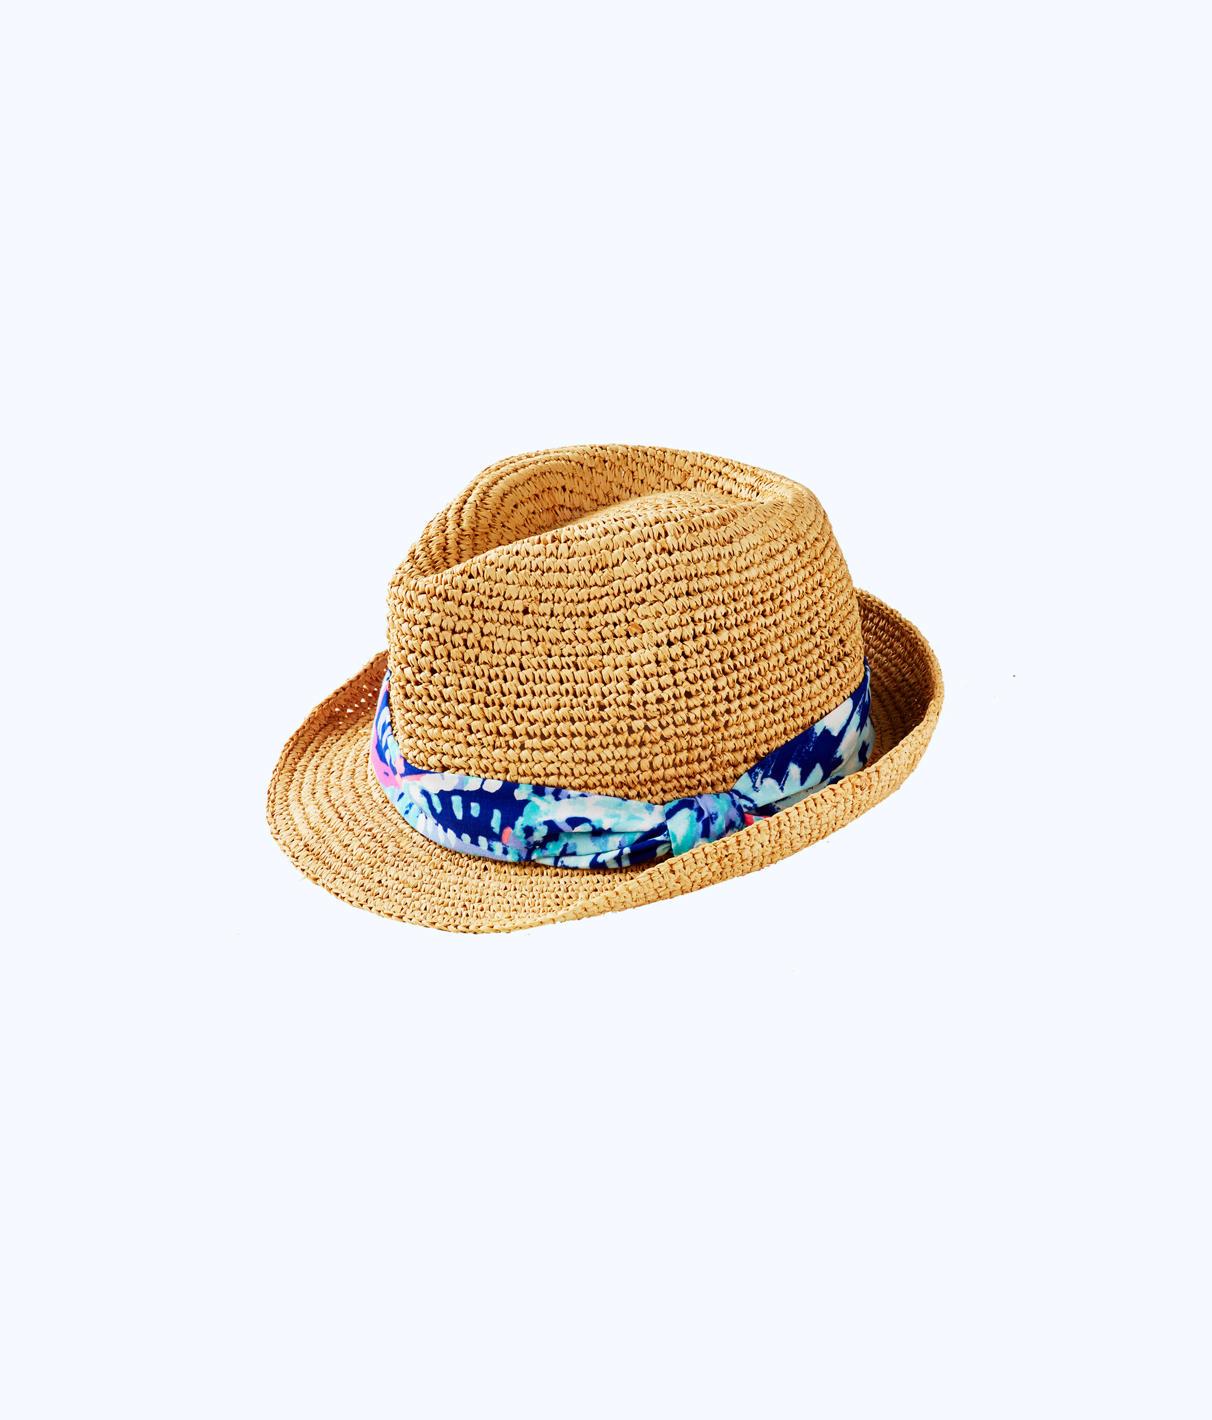 Lilly Pulitzer Lilly Pulitzer Womens Lilly Pulitzer Poolside Hat